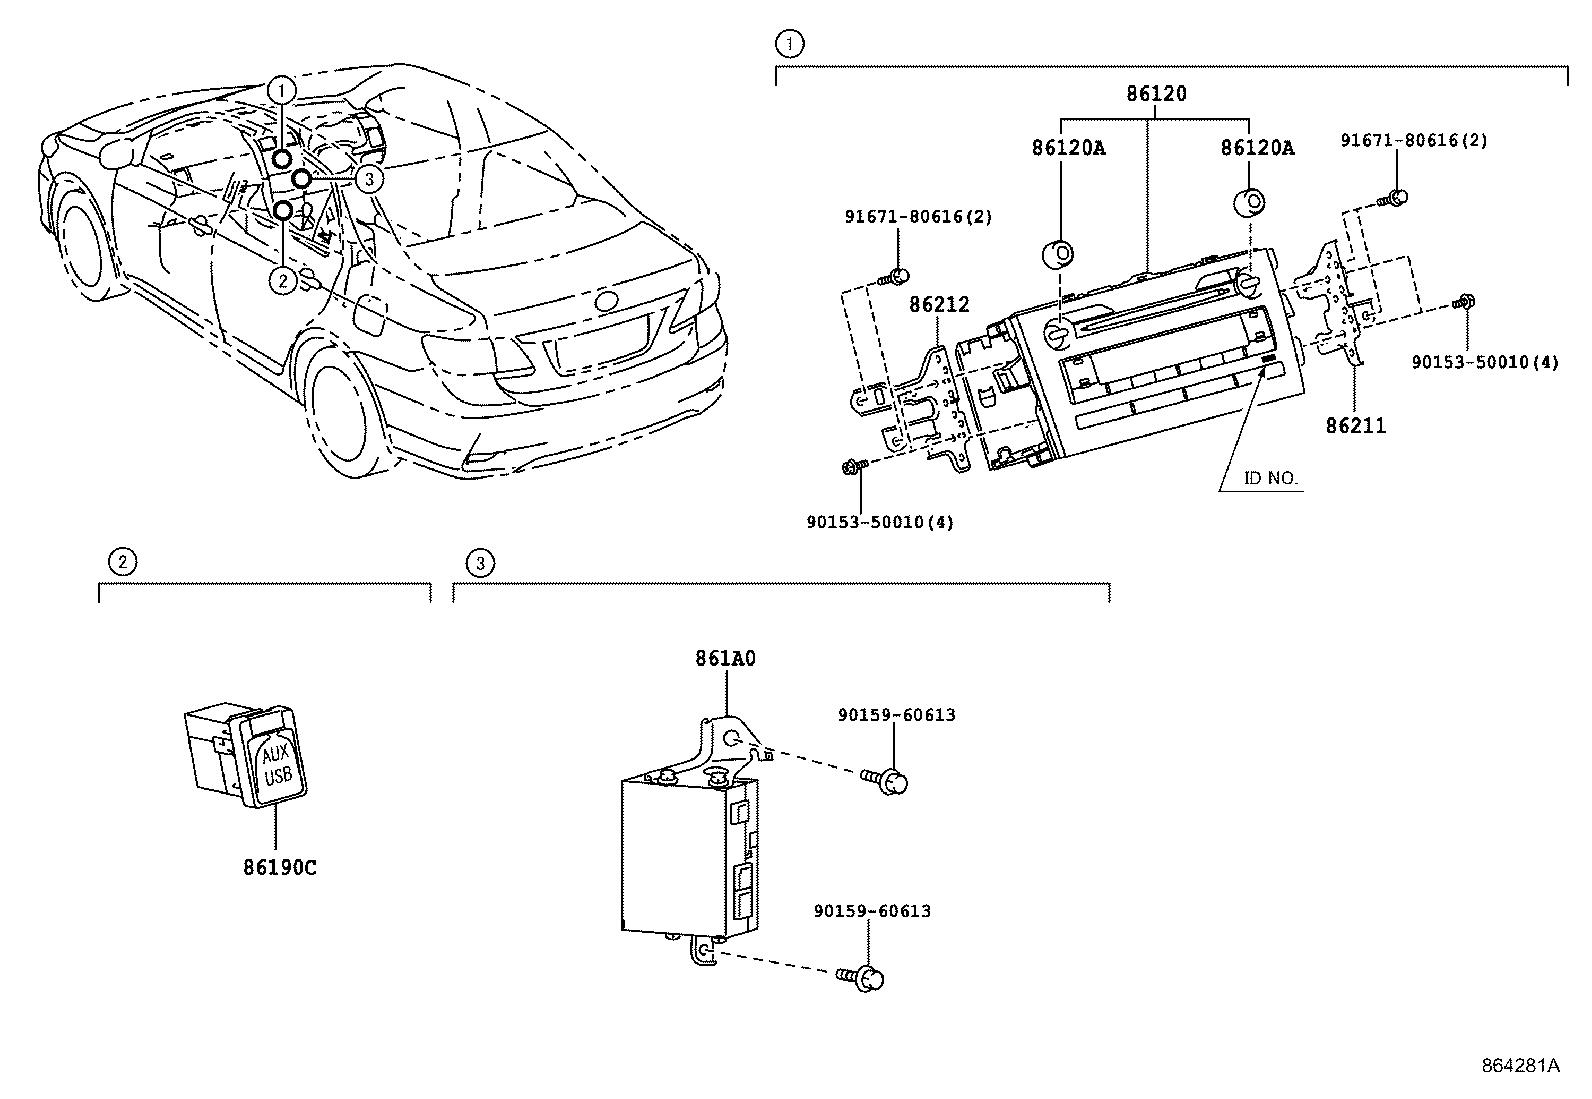 1006 sienna engine diagram auto electrical wiring diagramtoyota aurisnre150l defdk electrical